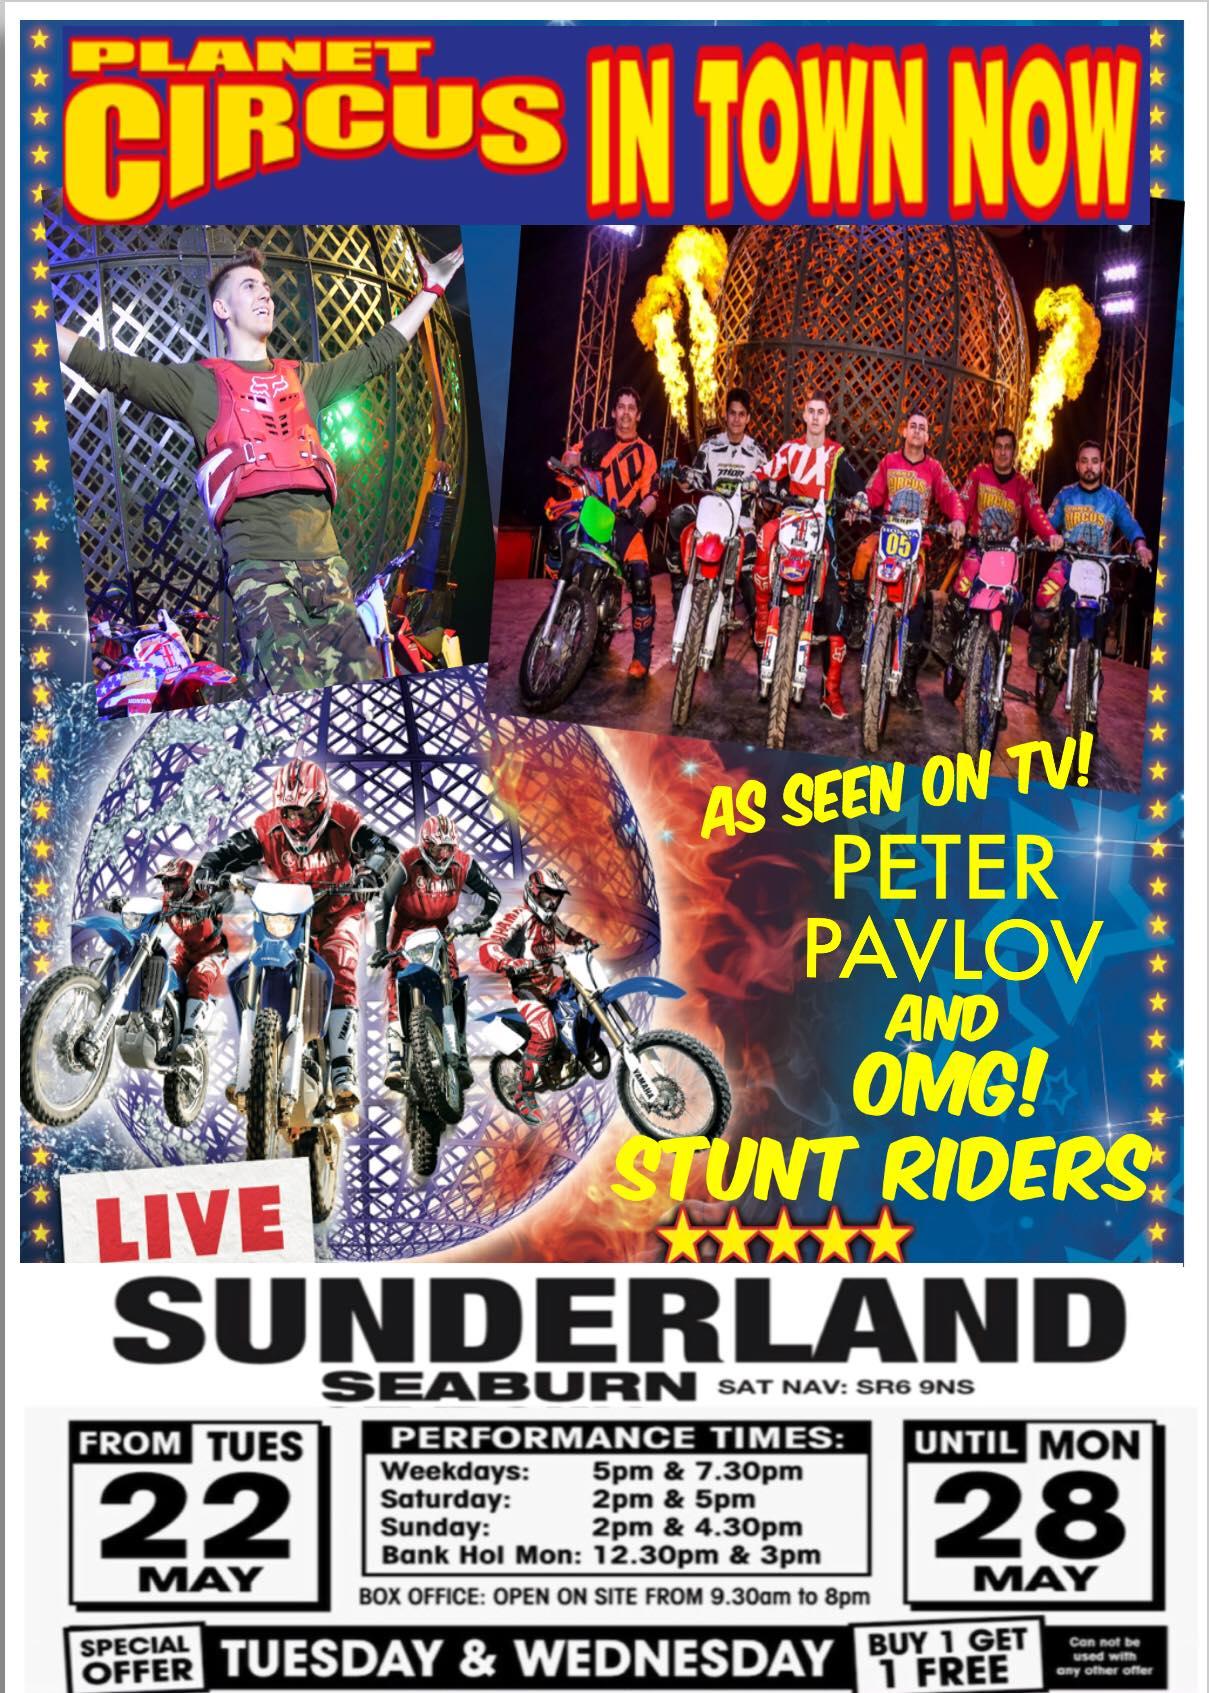 Planet Circus Seaburn Recreation Park Sunderland SR6